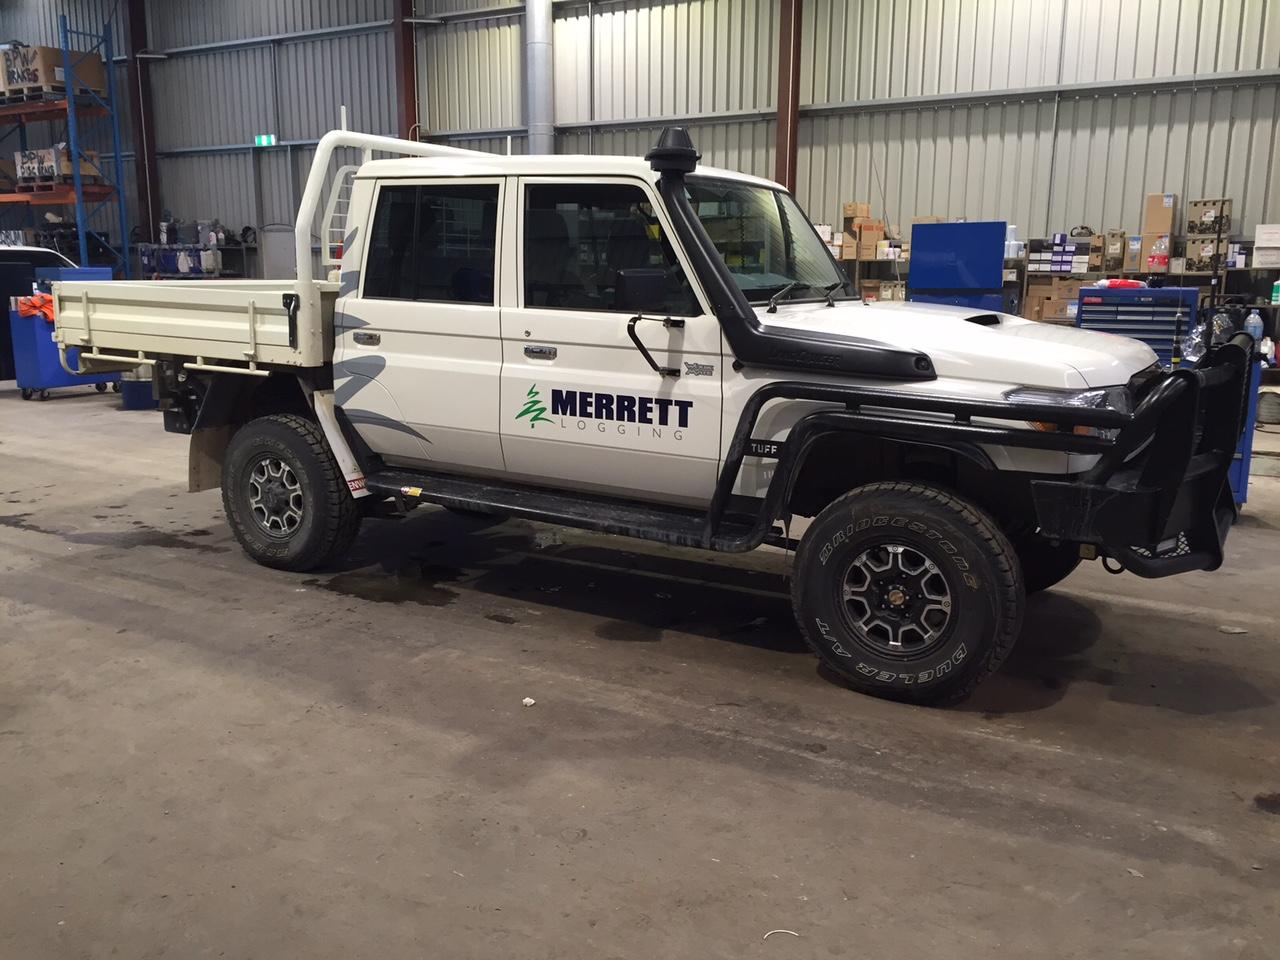 Merrett Logging Vehicle